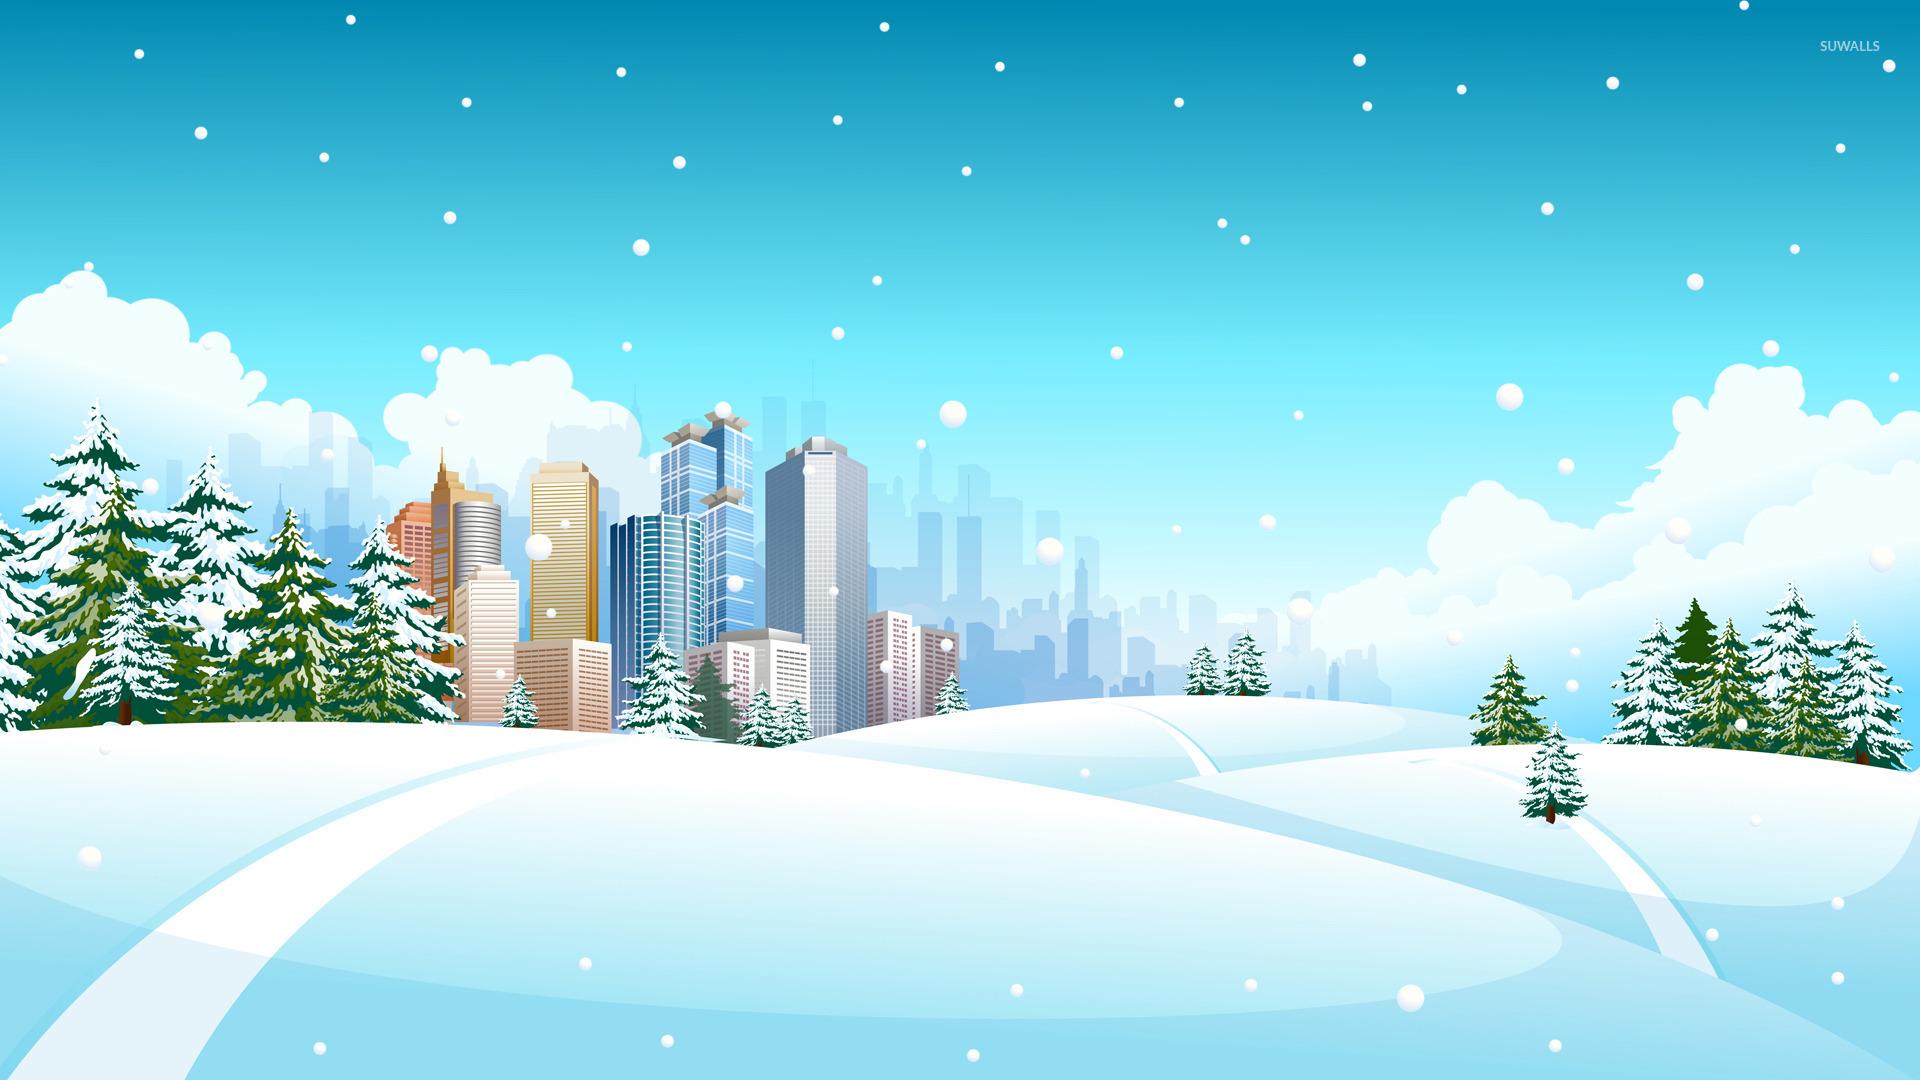 Winter Landscape 8 Wallpaper Vector Wallpapers 17052